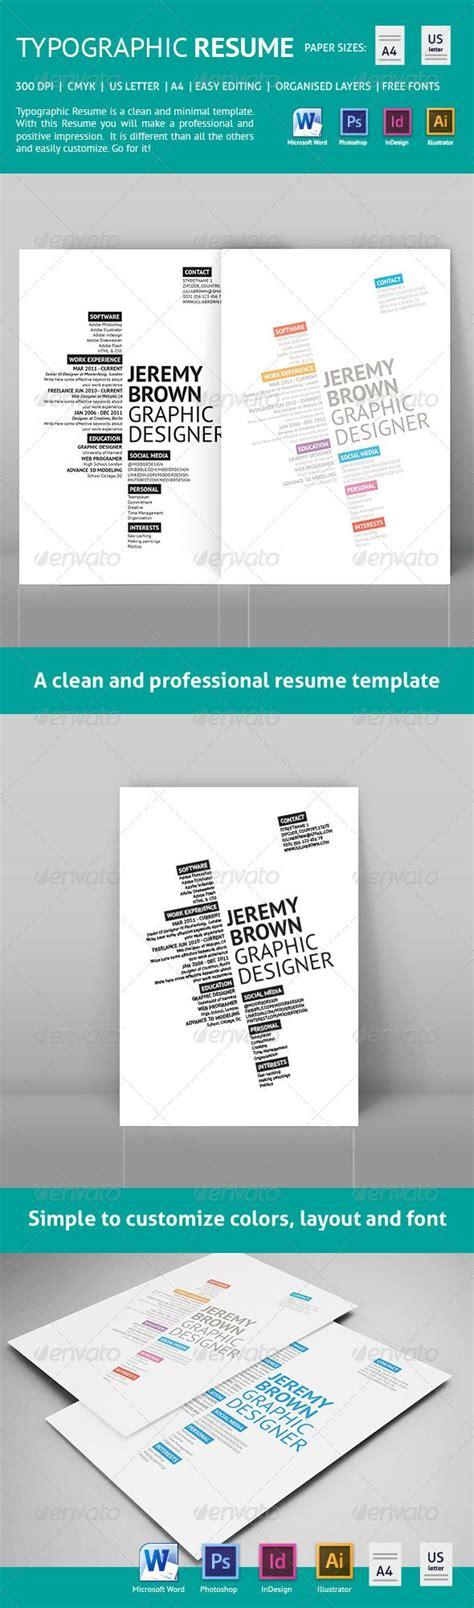 Killer Resume Templates by 1757 Best Killer Resume Template Design Images On